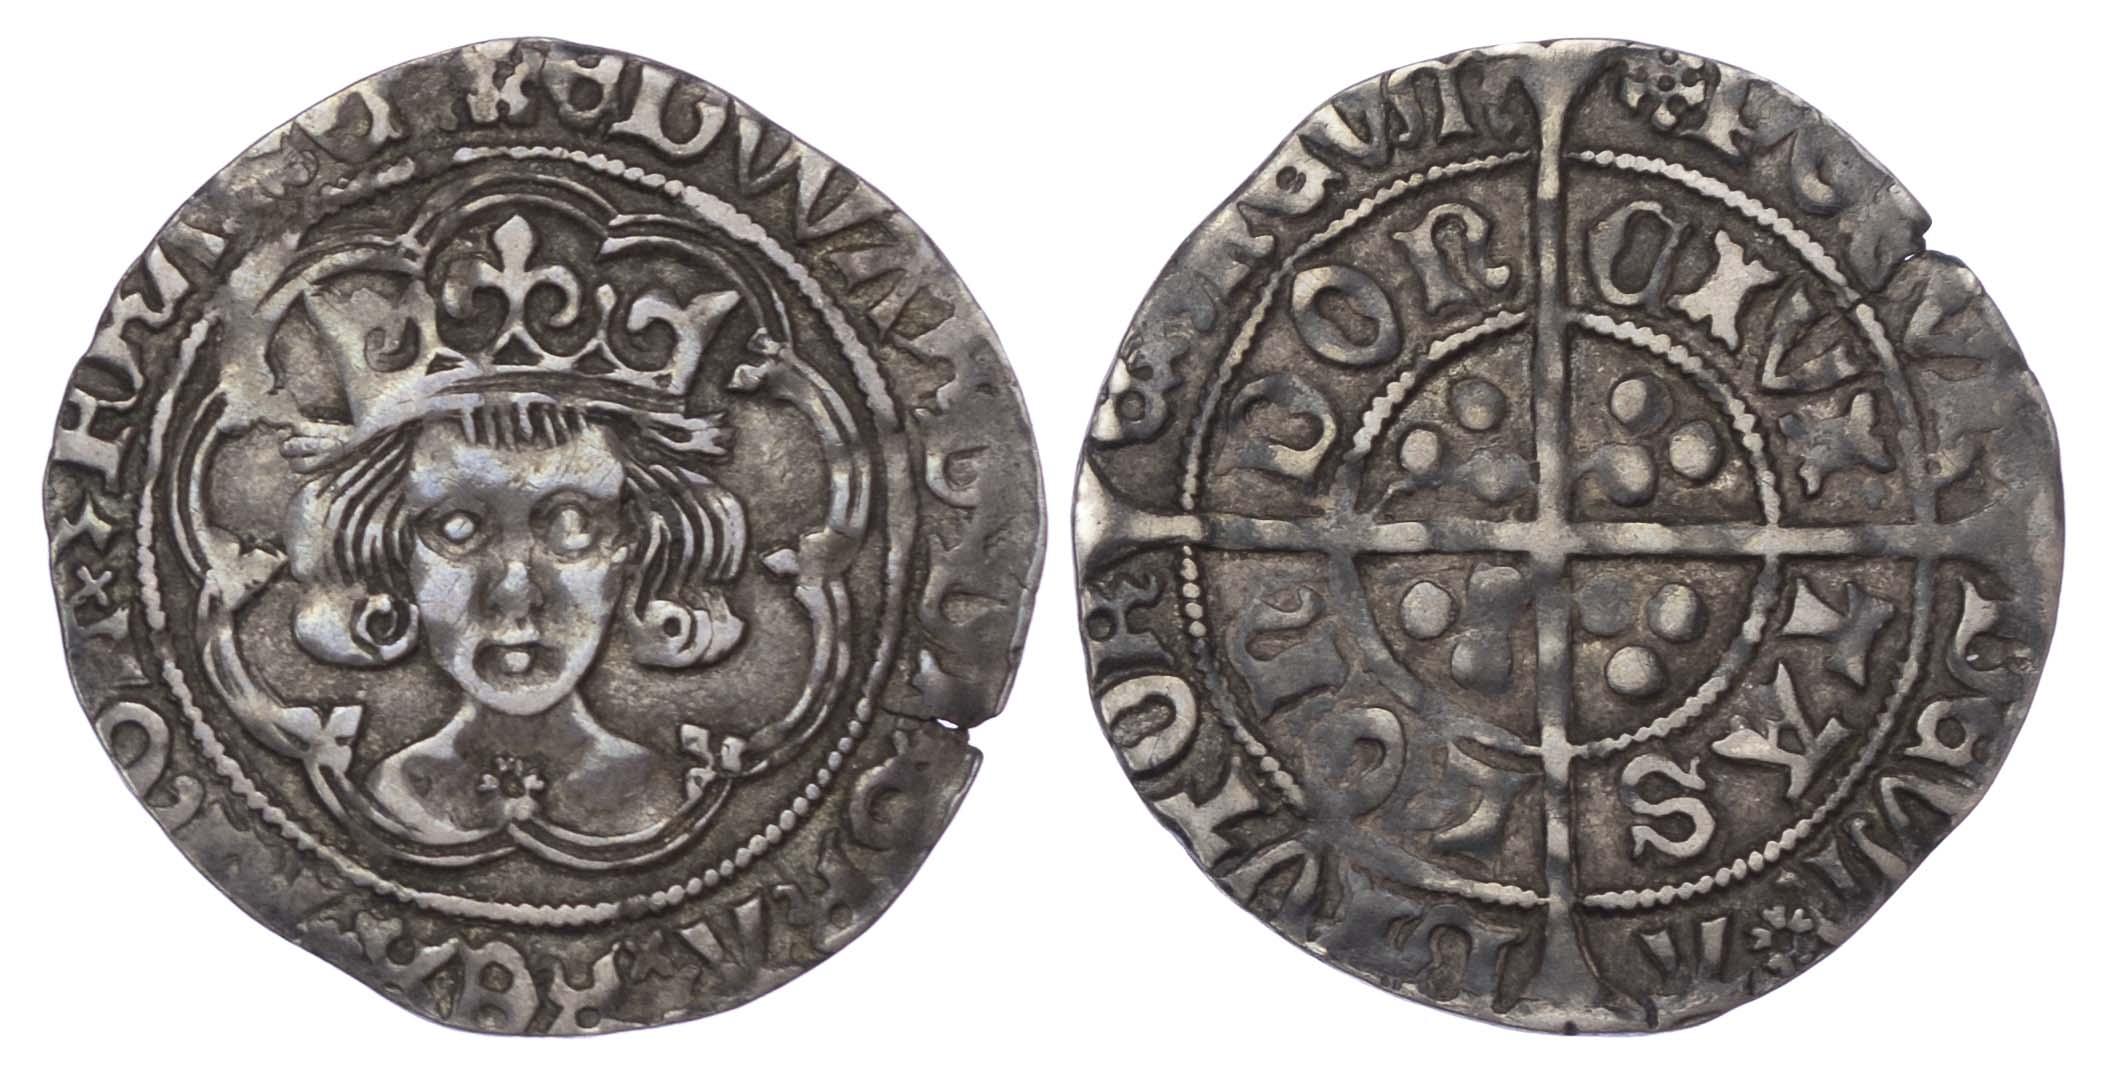 Edward IV (1471-83), Second reign, Groat, London, Type XXI